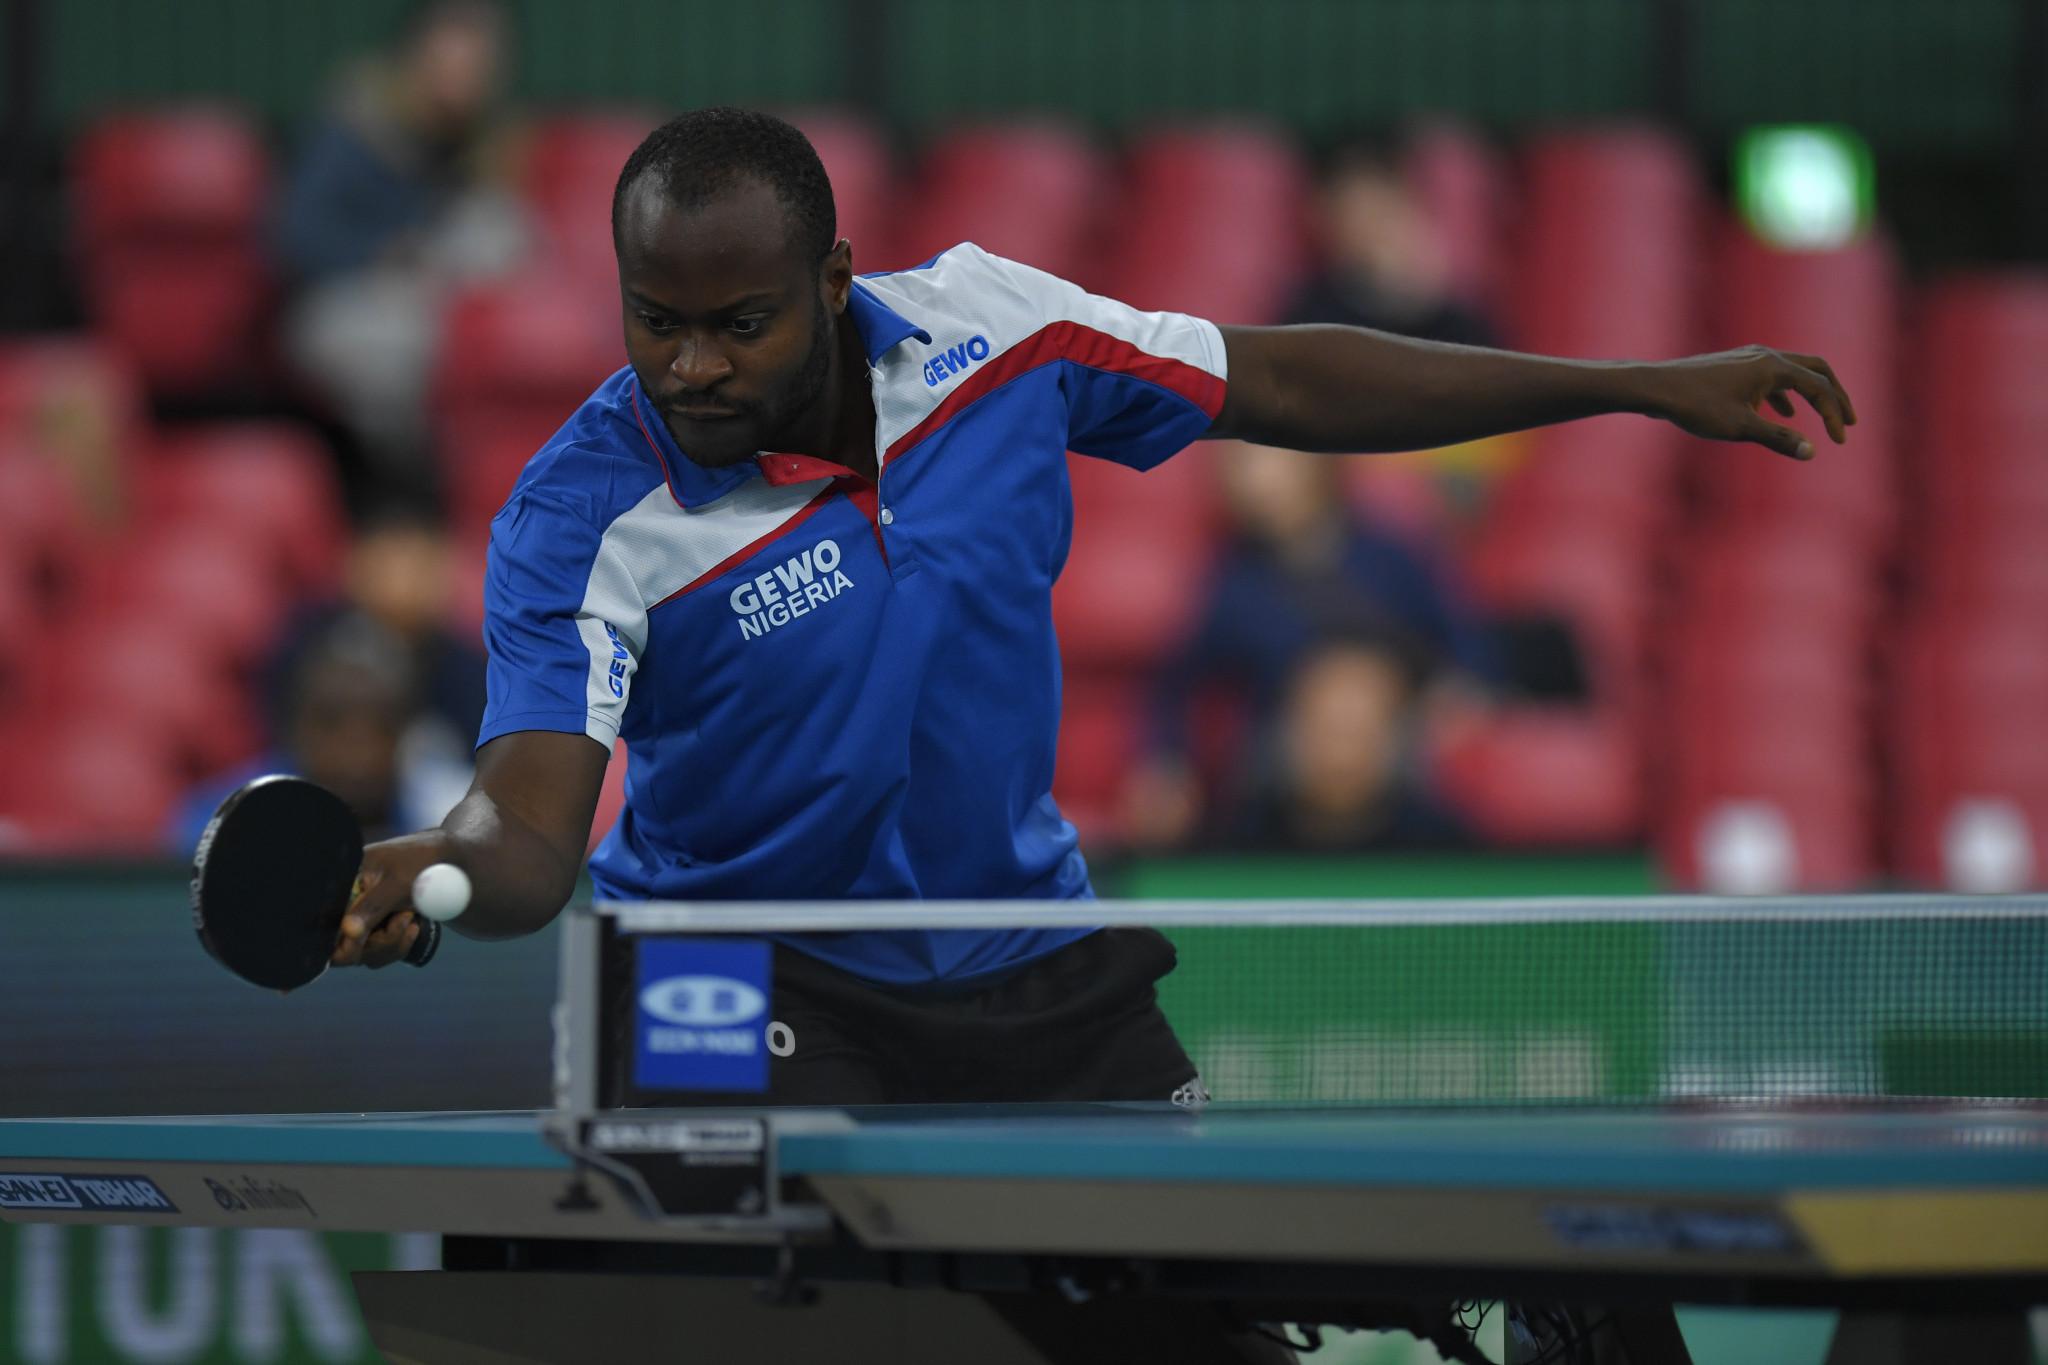 Aruna beats defending champion to reach ITTF Africa Top 16 Cup final